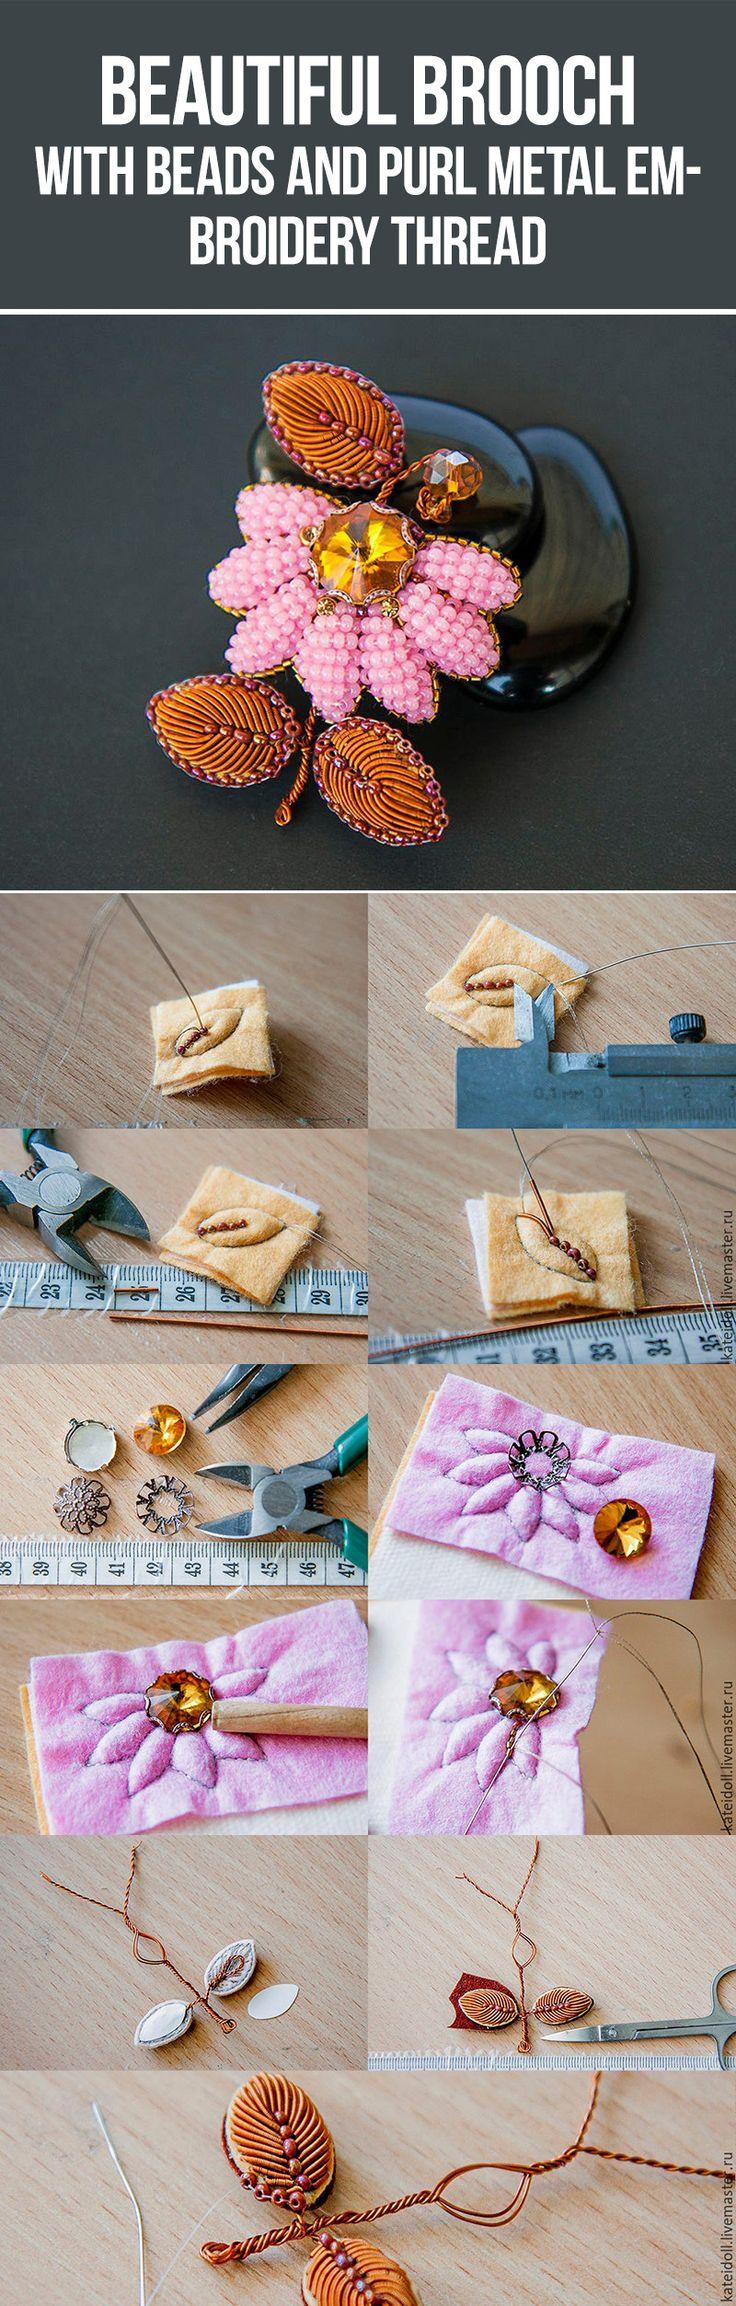 Beautiful brooch with beads & metal embroidery thread tutorial / Делаем осеннюю брошь «Георгина» в технике объемной вышивки